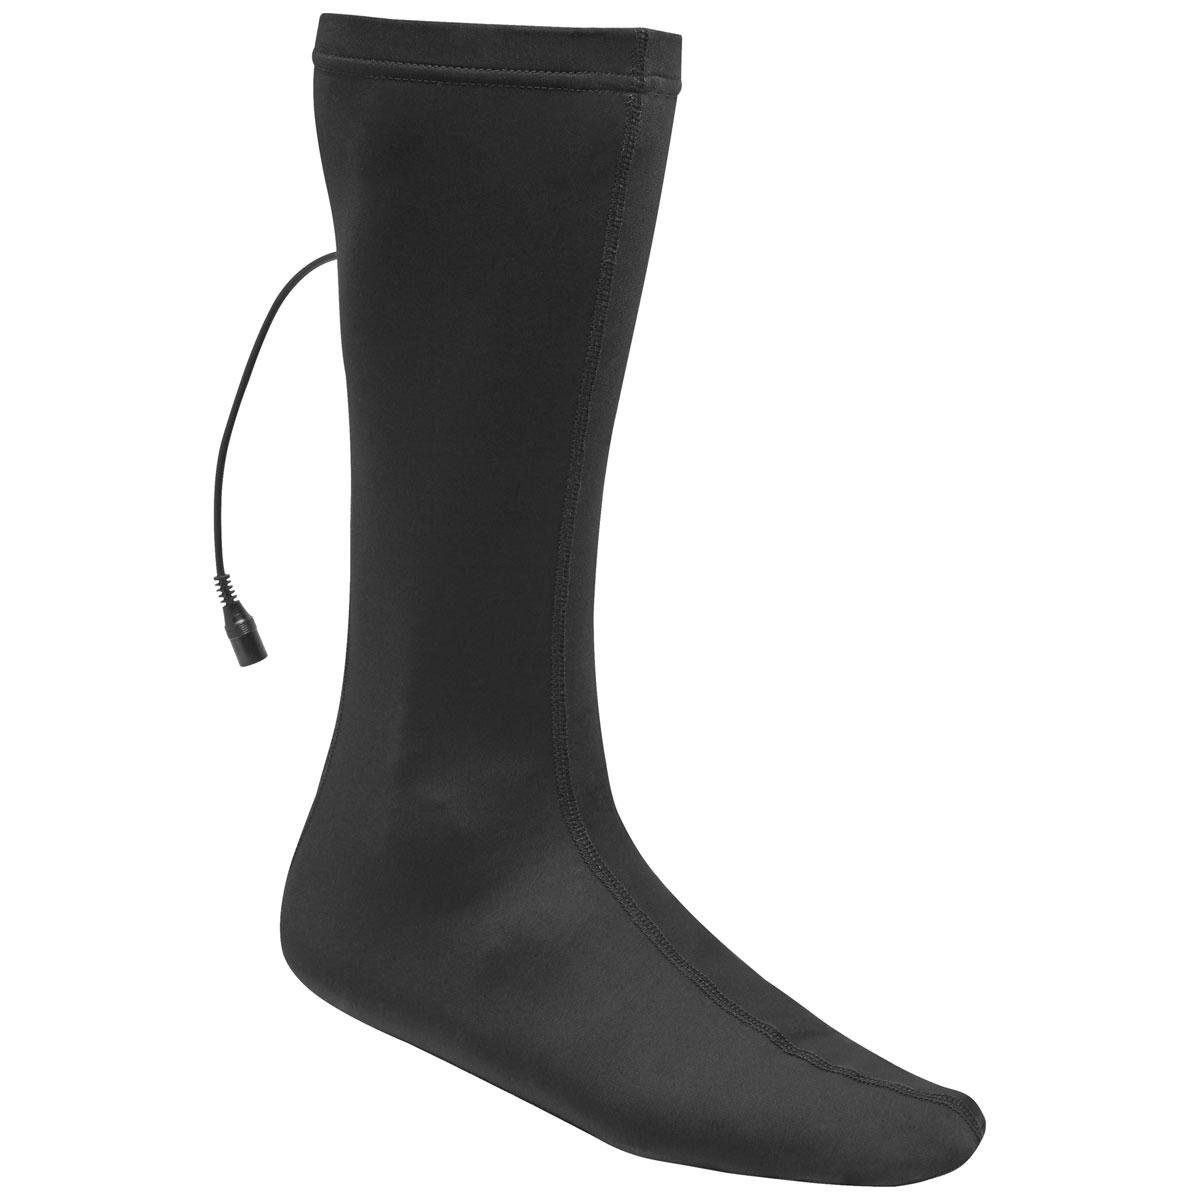 Firstgear 12v Heated Black Over Socks